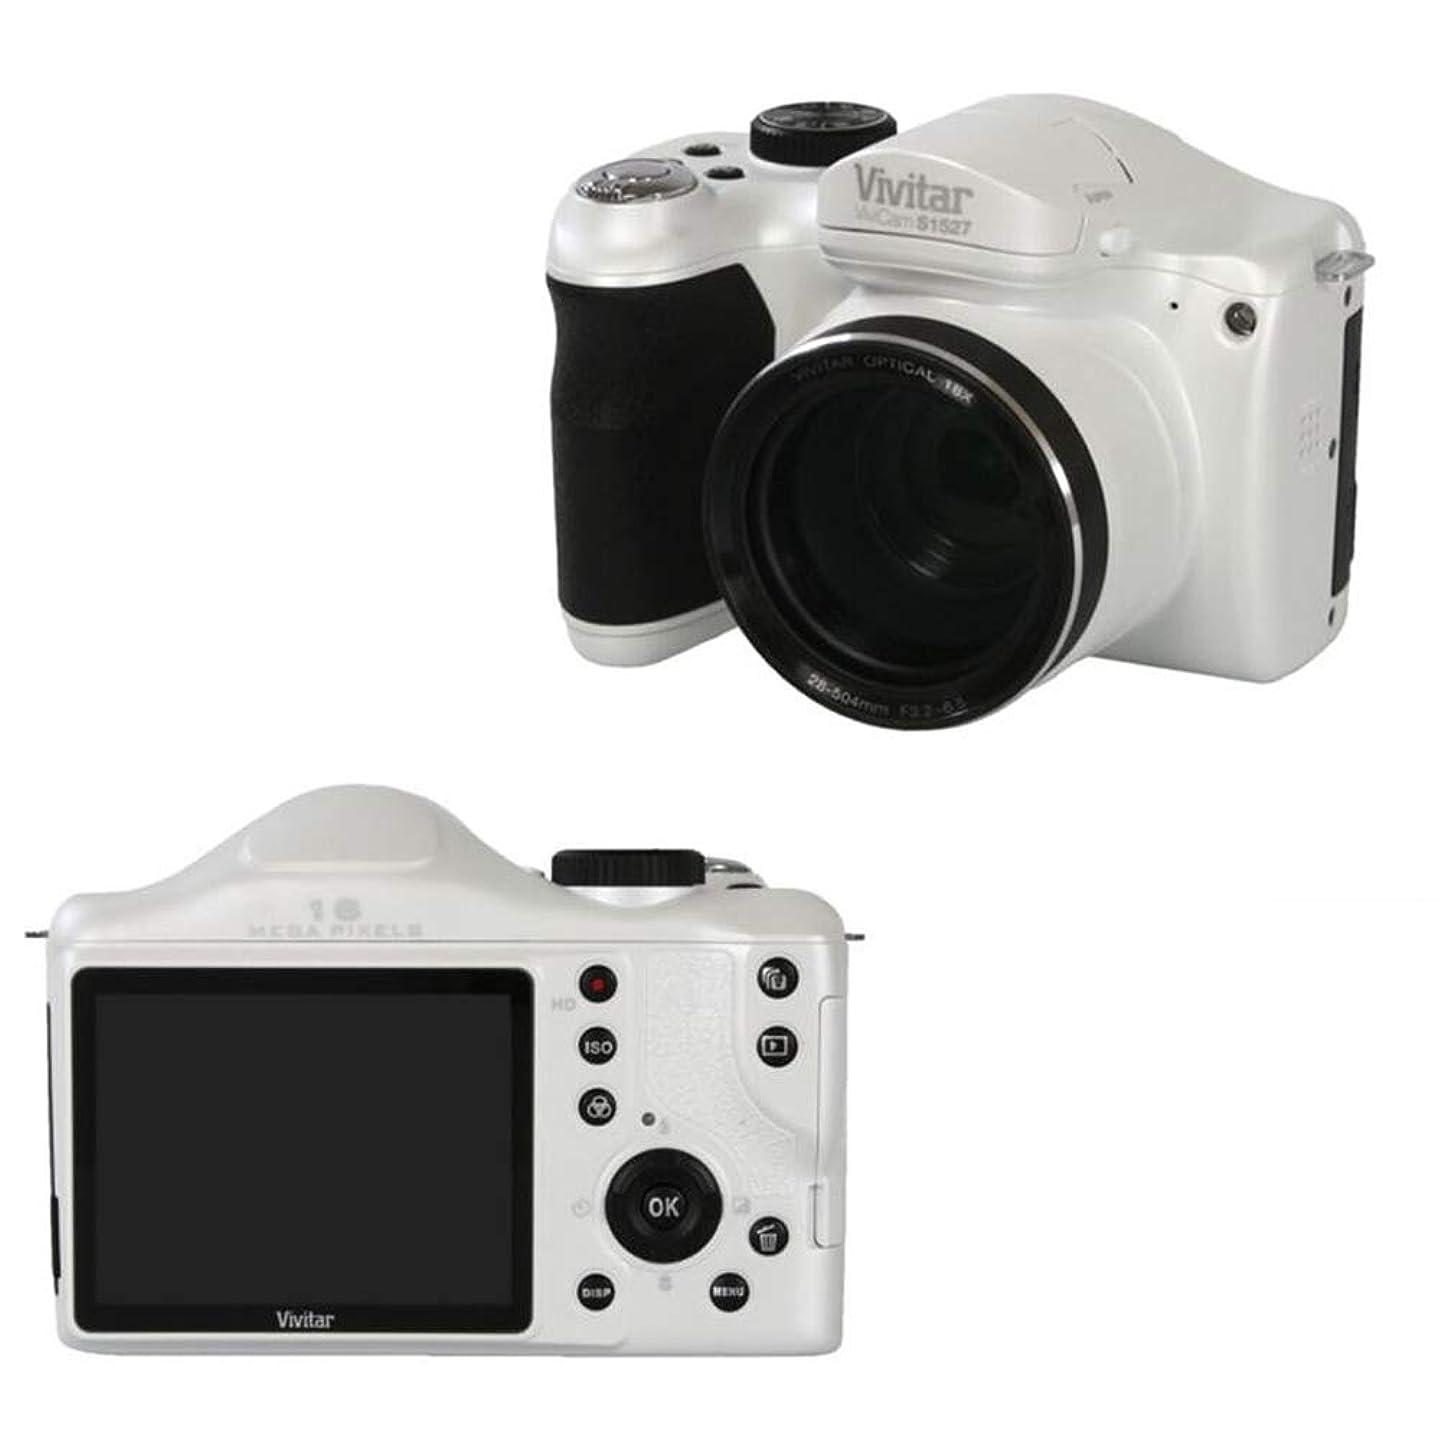 Auto Flash Bridge Digital Camera White 18x Optical Zoom HD-720p